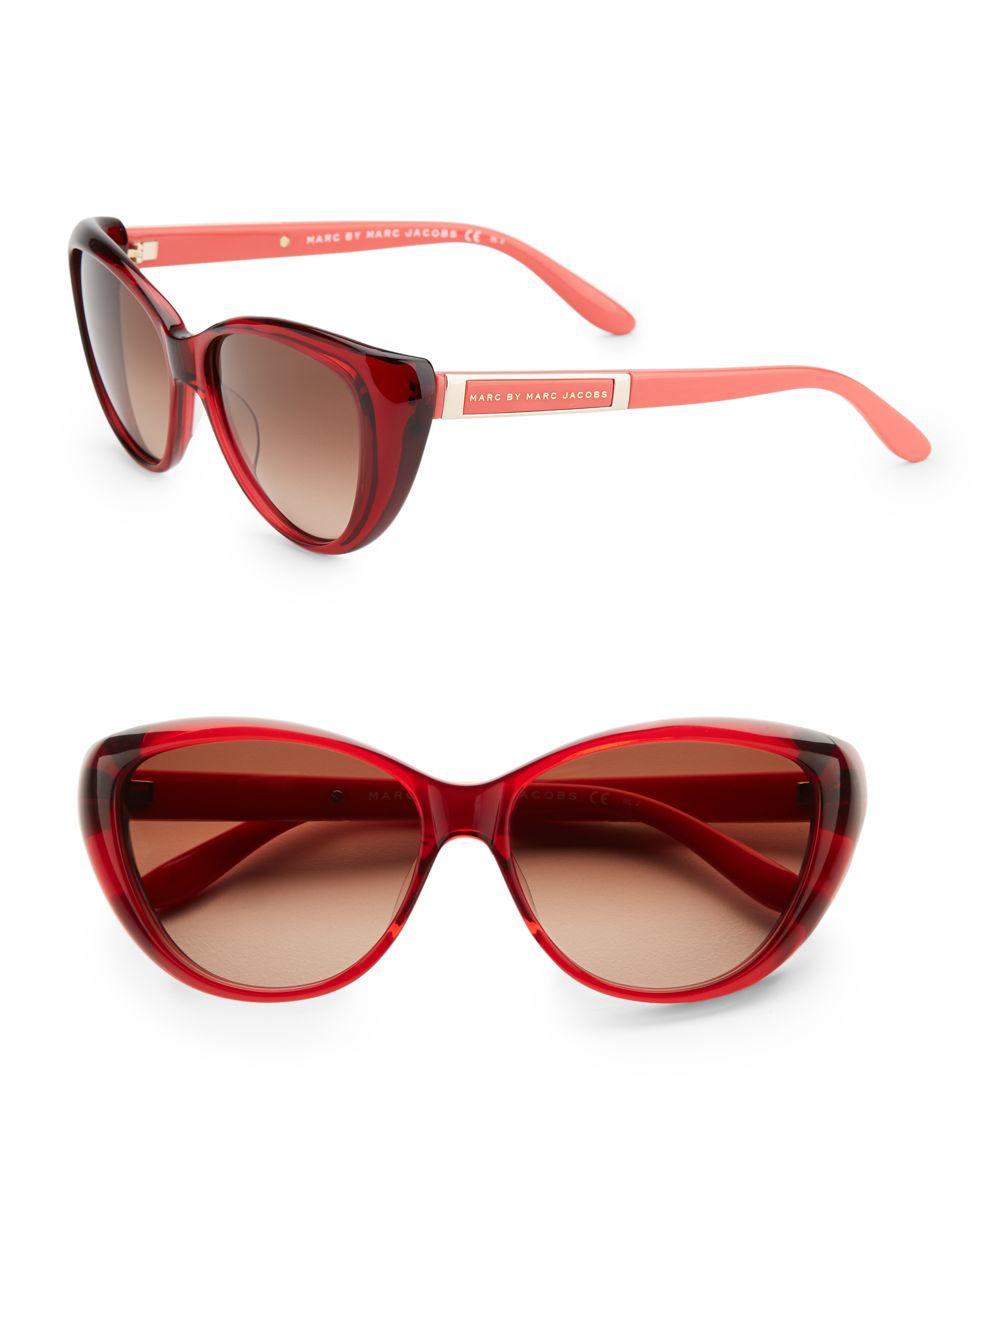 Marc Jacobs Red Cat Eye Frames